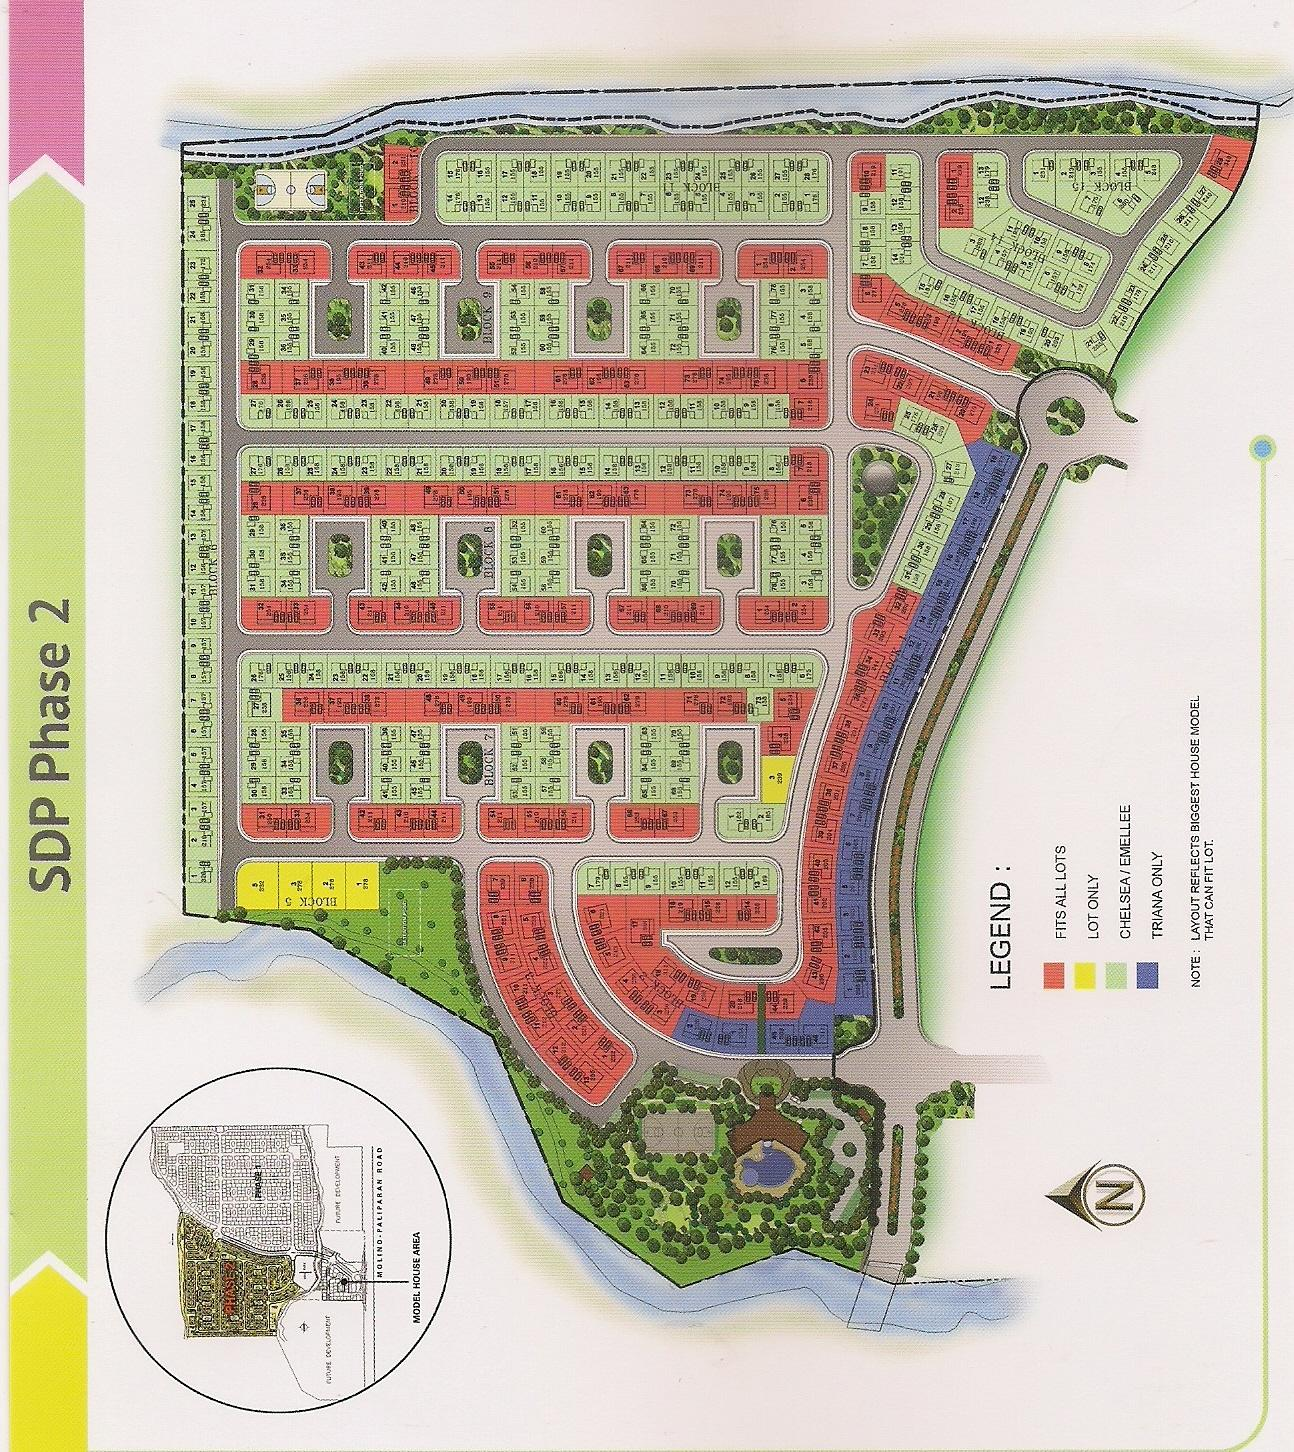 Avida Settings Cavite - Site Development Plan